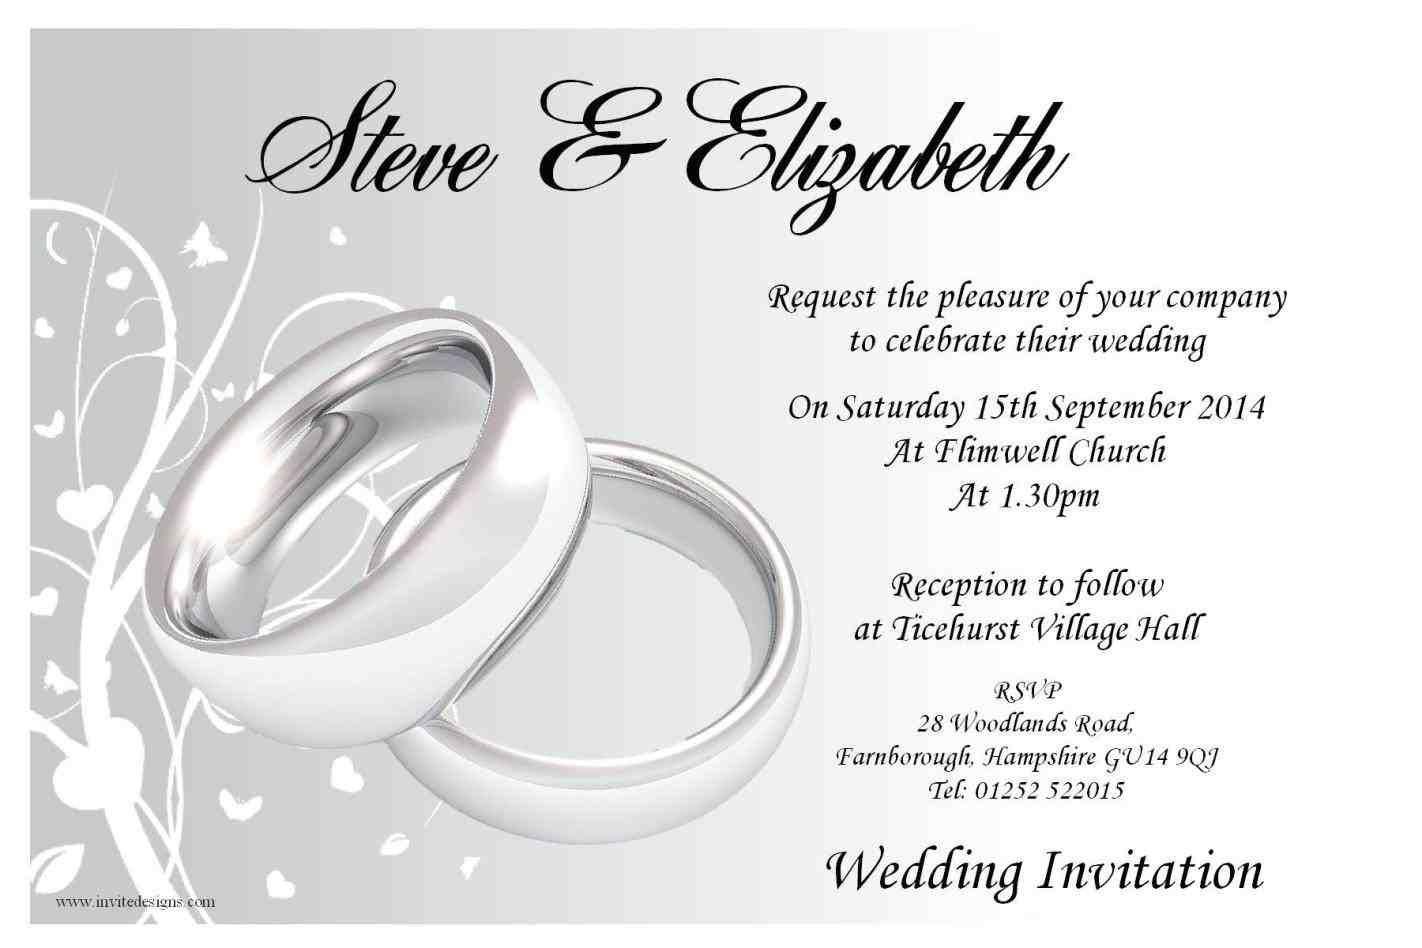 Top 10 New Post Fancy Wedding Invitations Template Visit Wedbridalsite: Fancy Wedding Invitations Templates At Websimilar.org